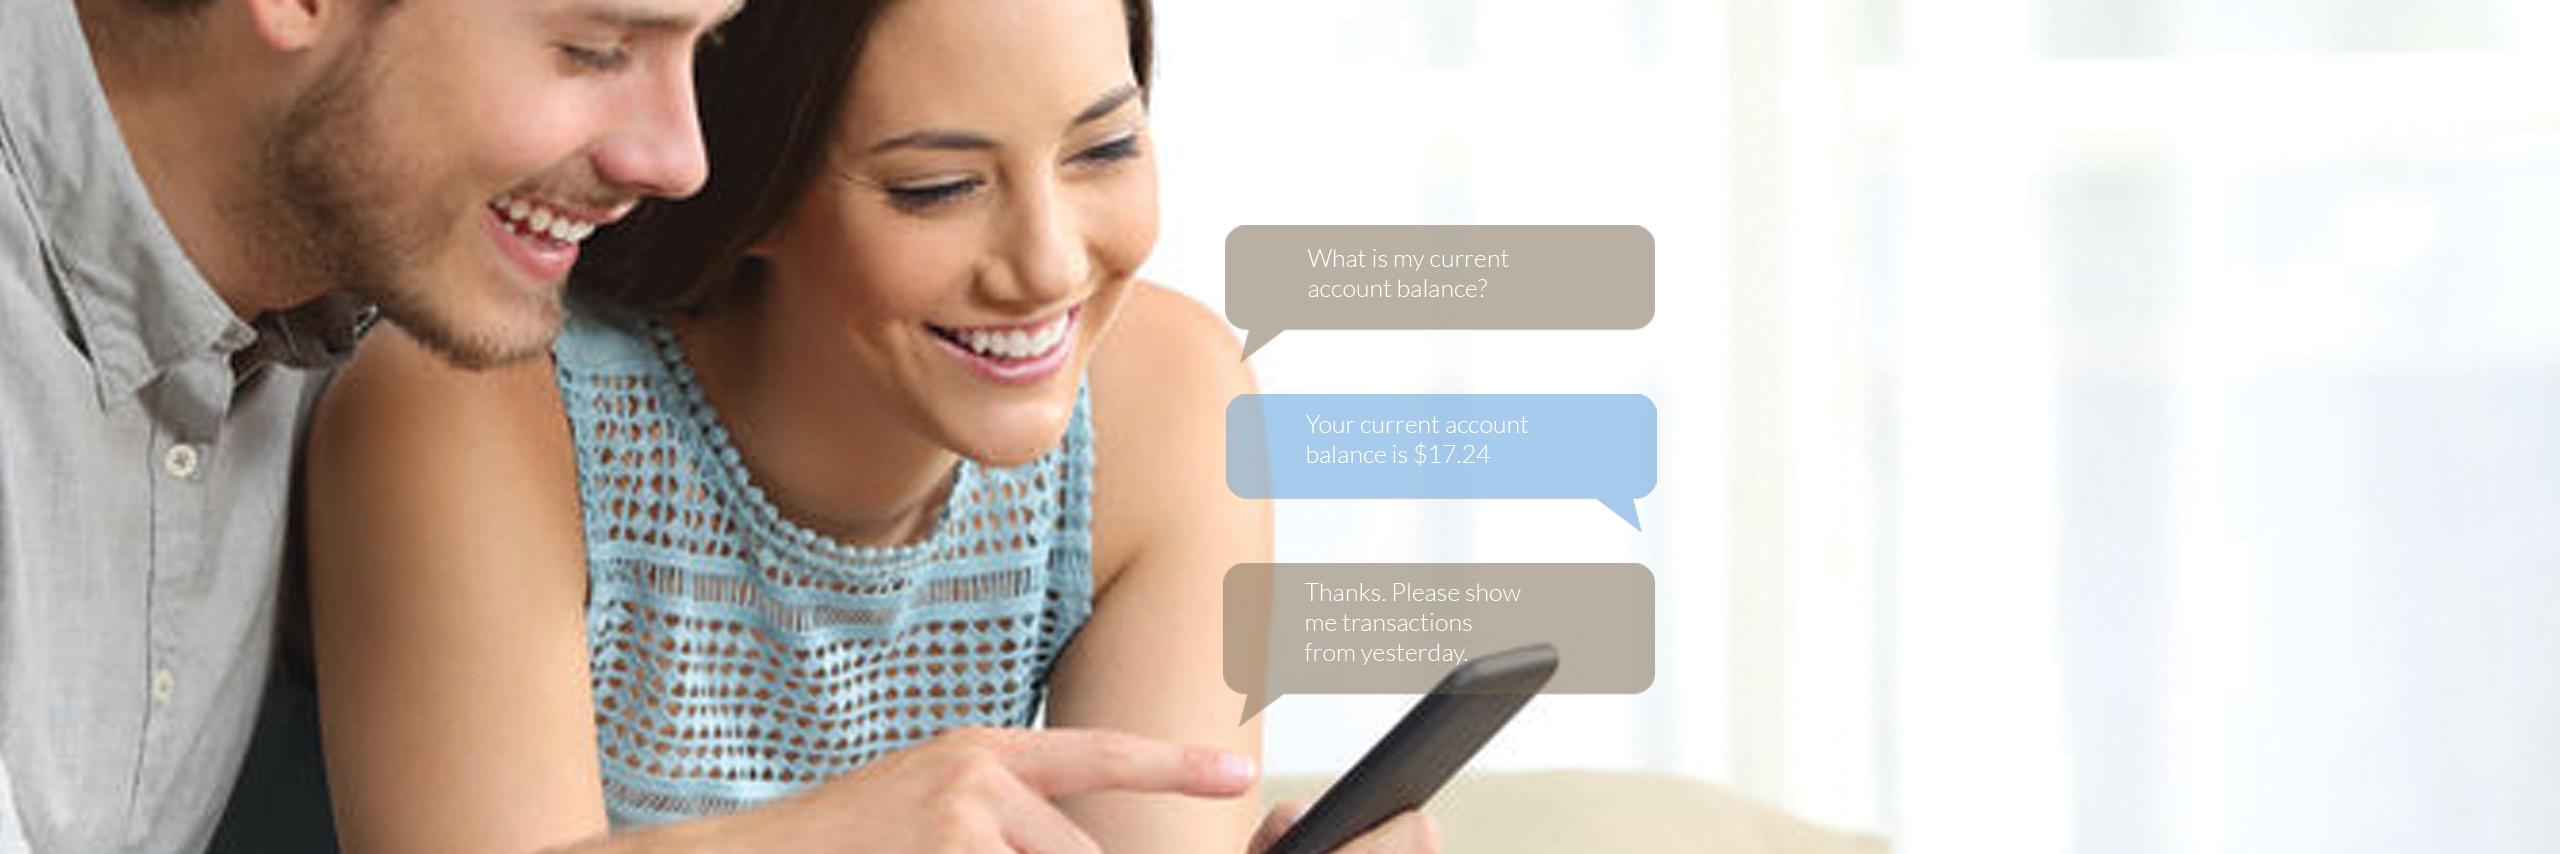 Clayfin - Chatbot banking